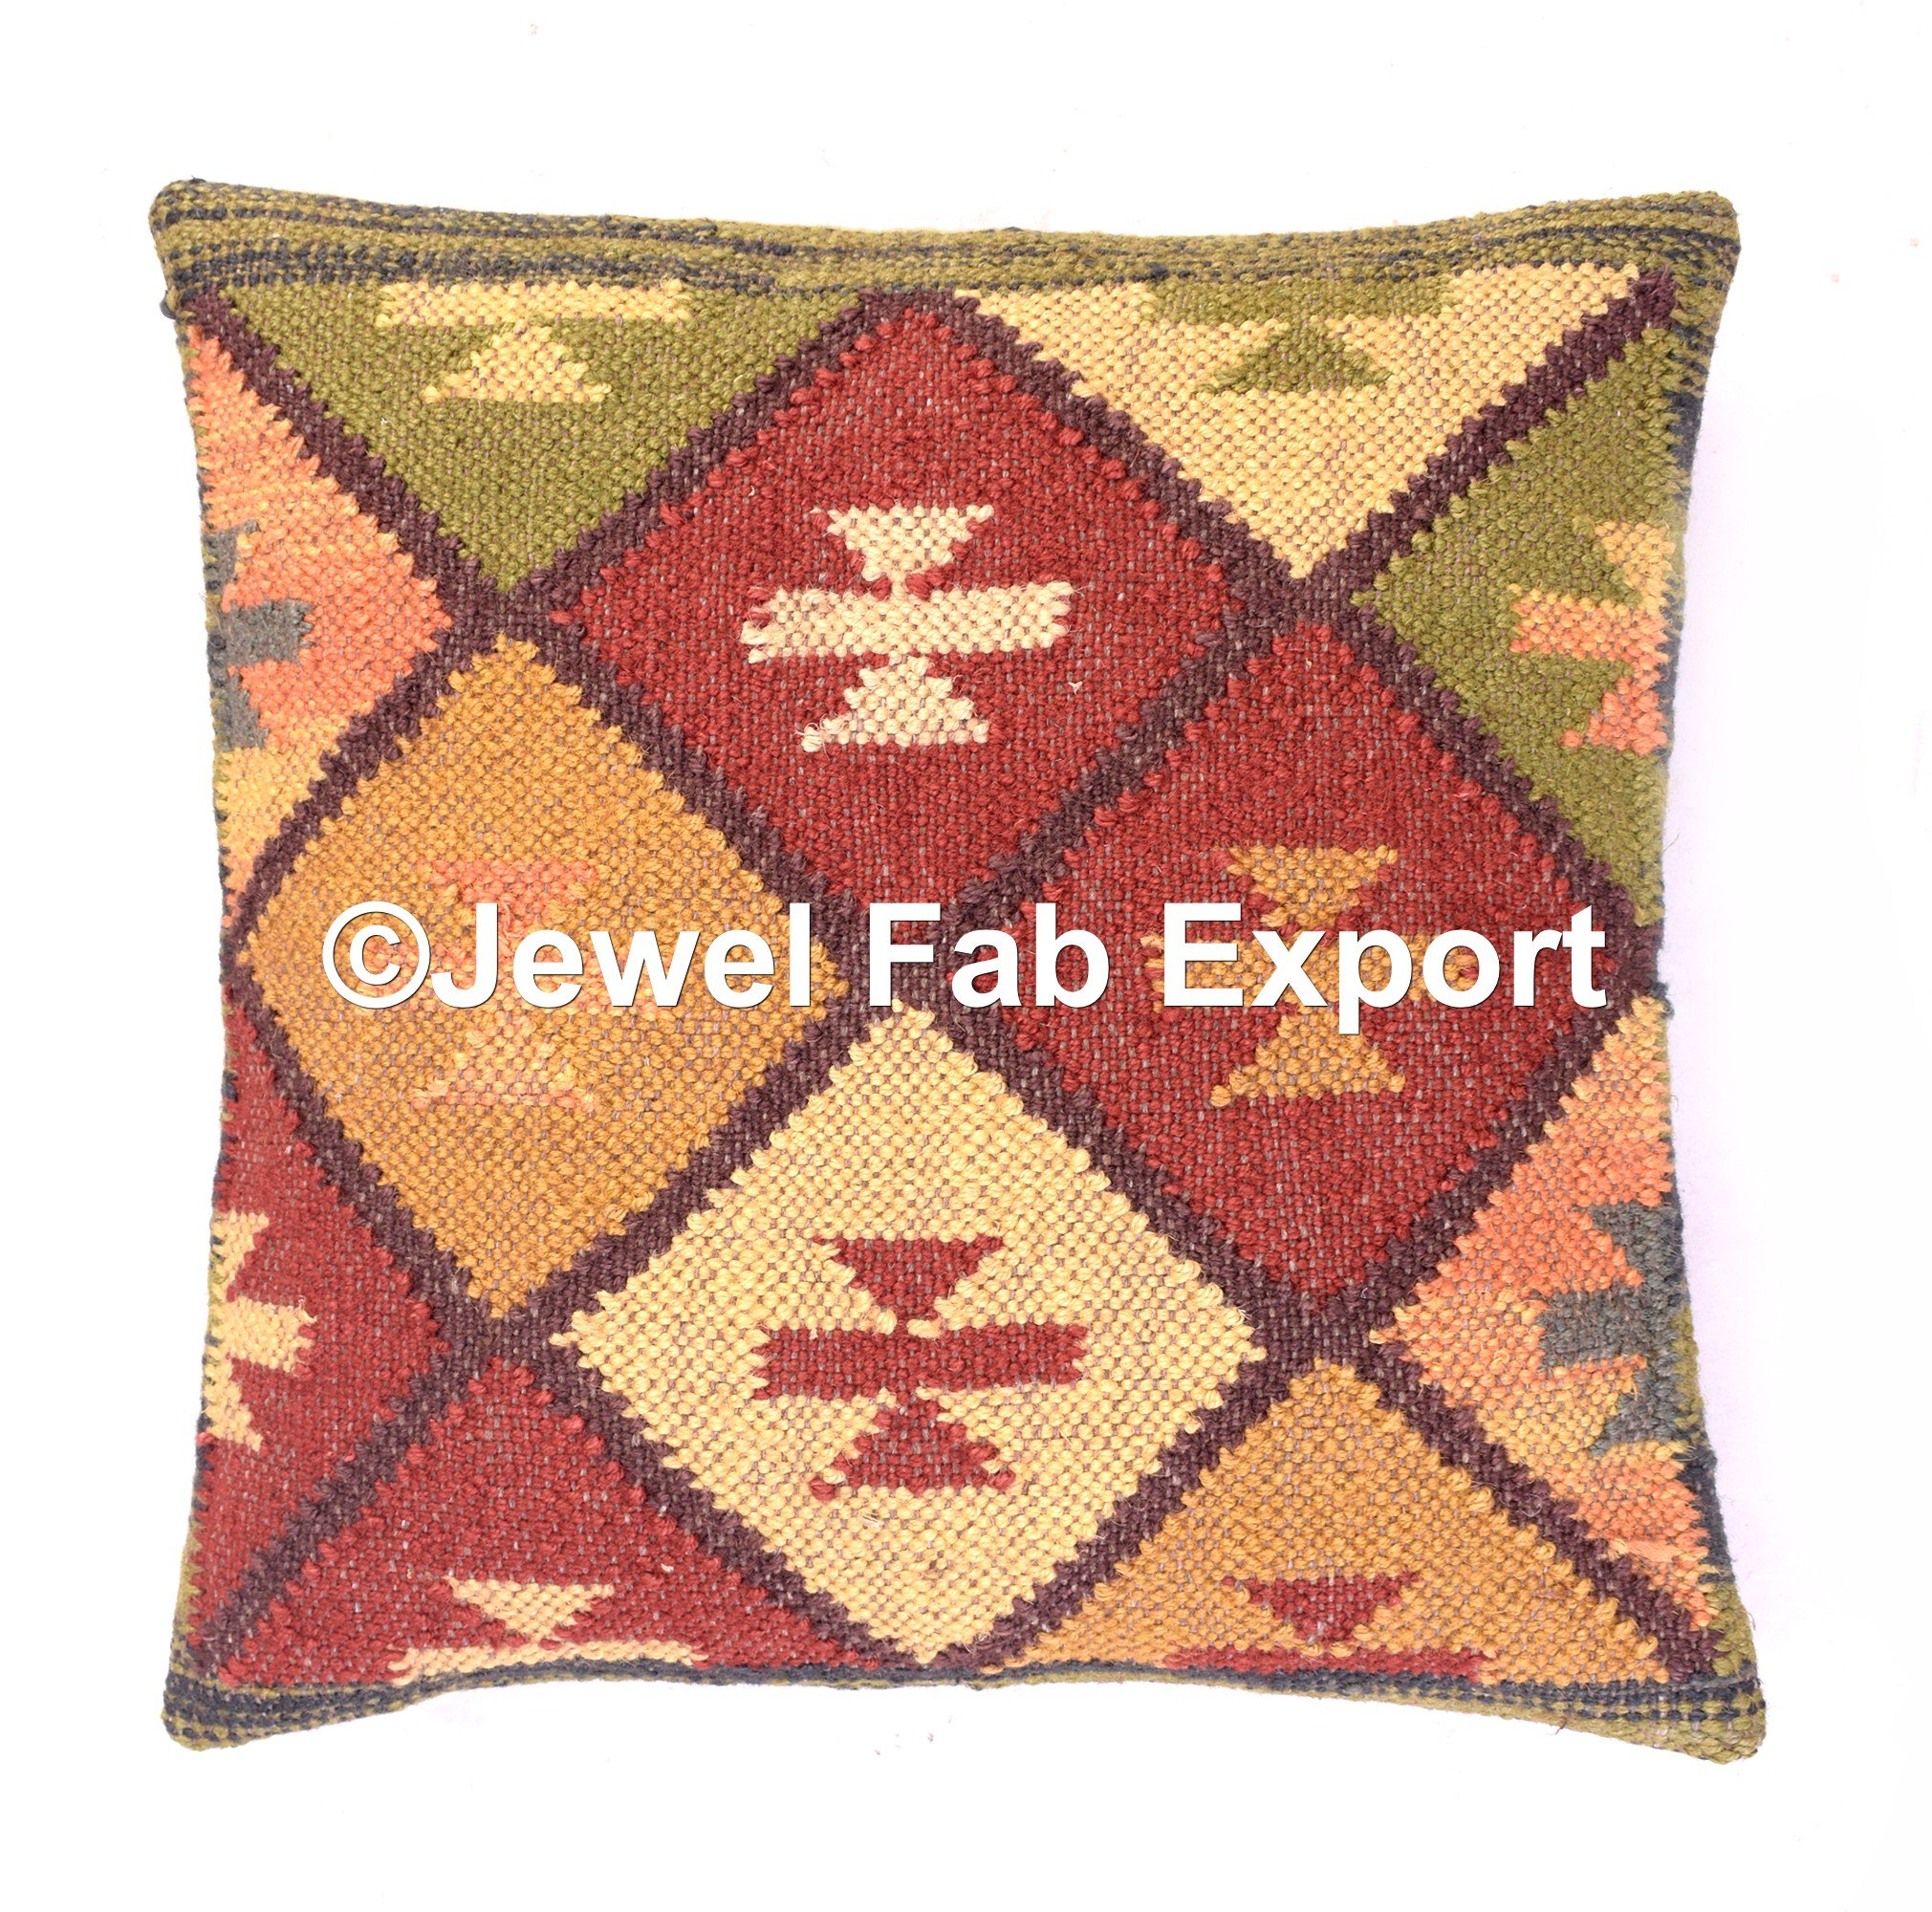 Indian Set Of 5 ,18x18'' Vintage Ethnic Kilim Rug Cushion HAndwoven Jute Cuashion Decorative Cushion Cases Sofa Hippie Pillow Sham Living Room Pillow Throw Handmade Jute Boho Sham Throw by Jewel Fab Art